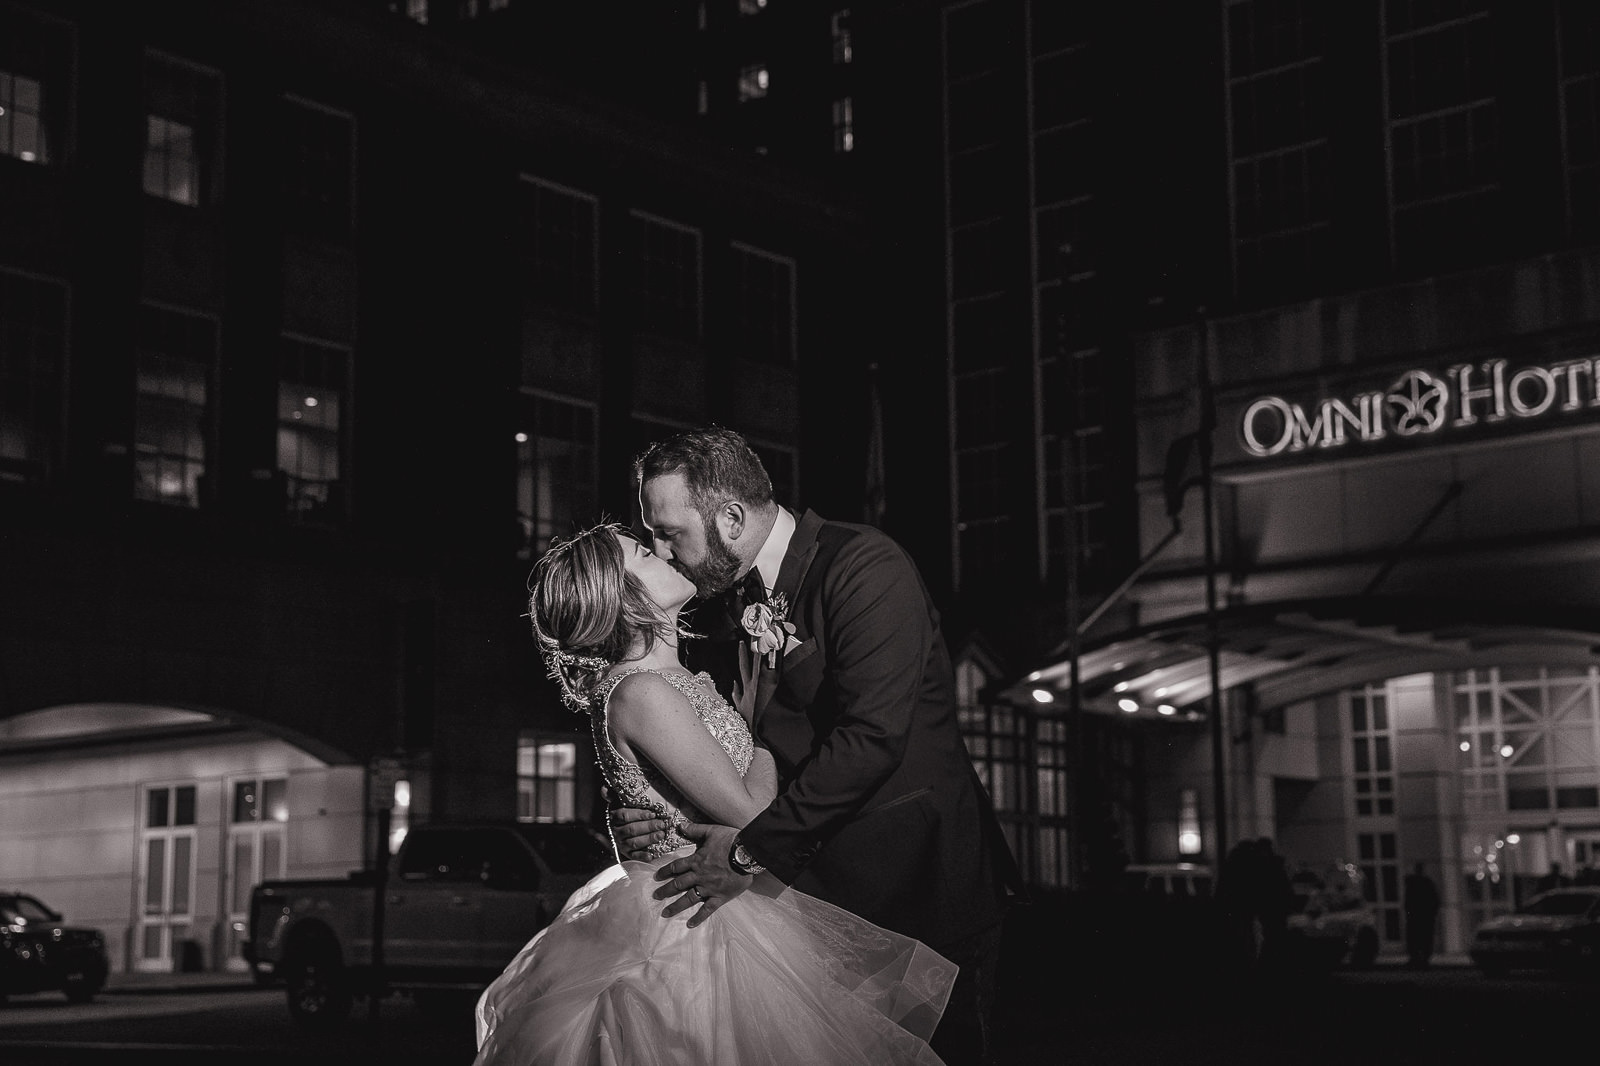 Omni Hotel Providence, Omni, Providence, Rhode Island, RI, Wedding, city wedding, November wedding, Tracy Jenkins Photography, RI wedding photographer, Rhode Island Wedding photographer, romantic photos, couple photos, kiss